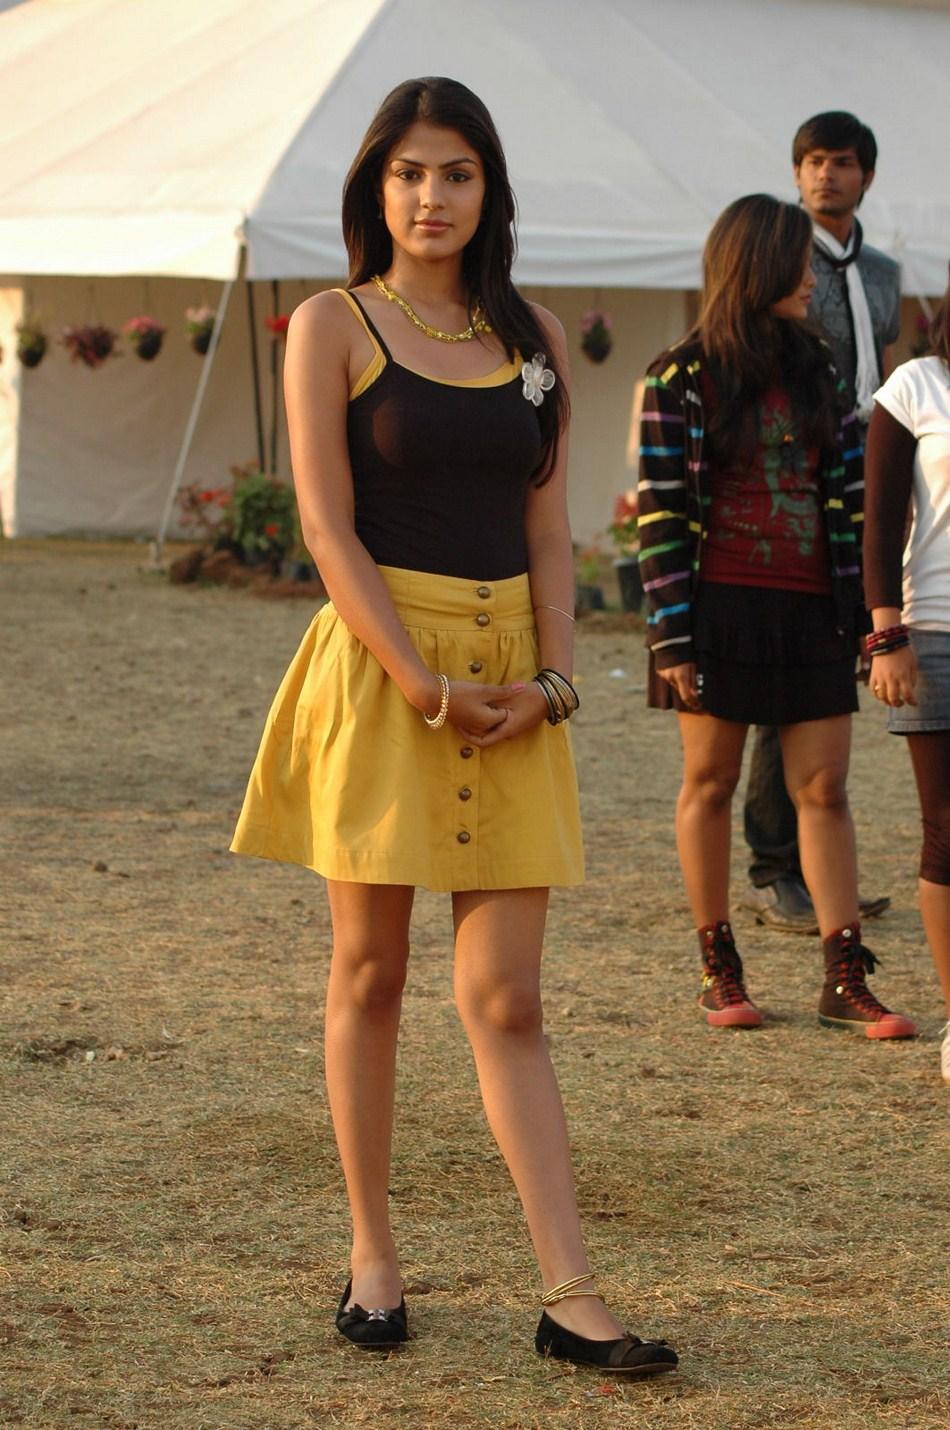 Rhea Chakraborty 15 Photos Of Super Hot Unseen Bikini Bra Swimsuit Pics  Wallpapers -5402